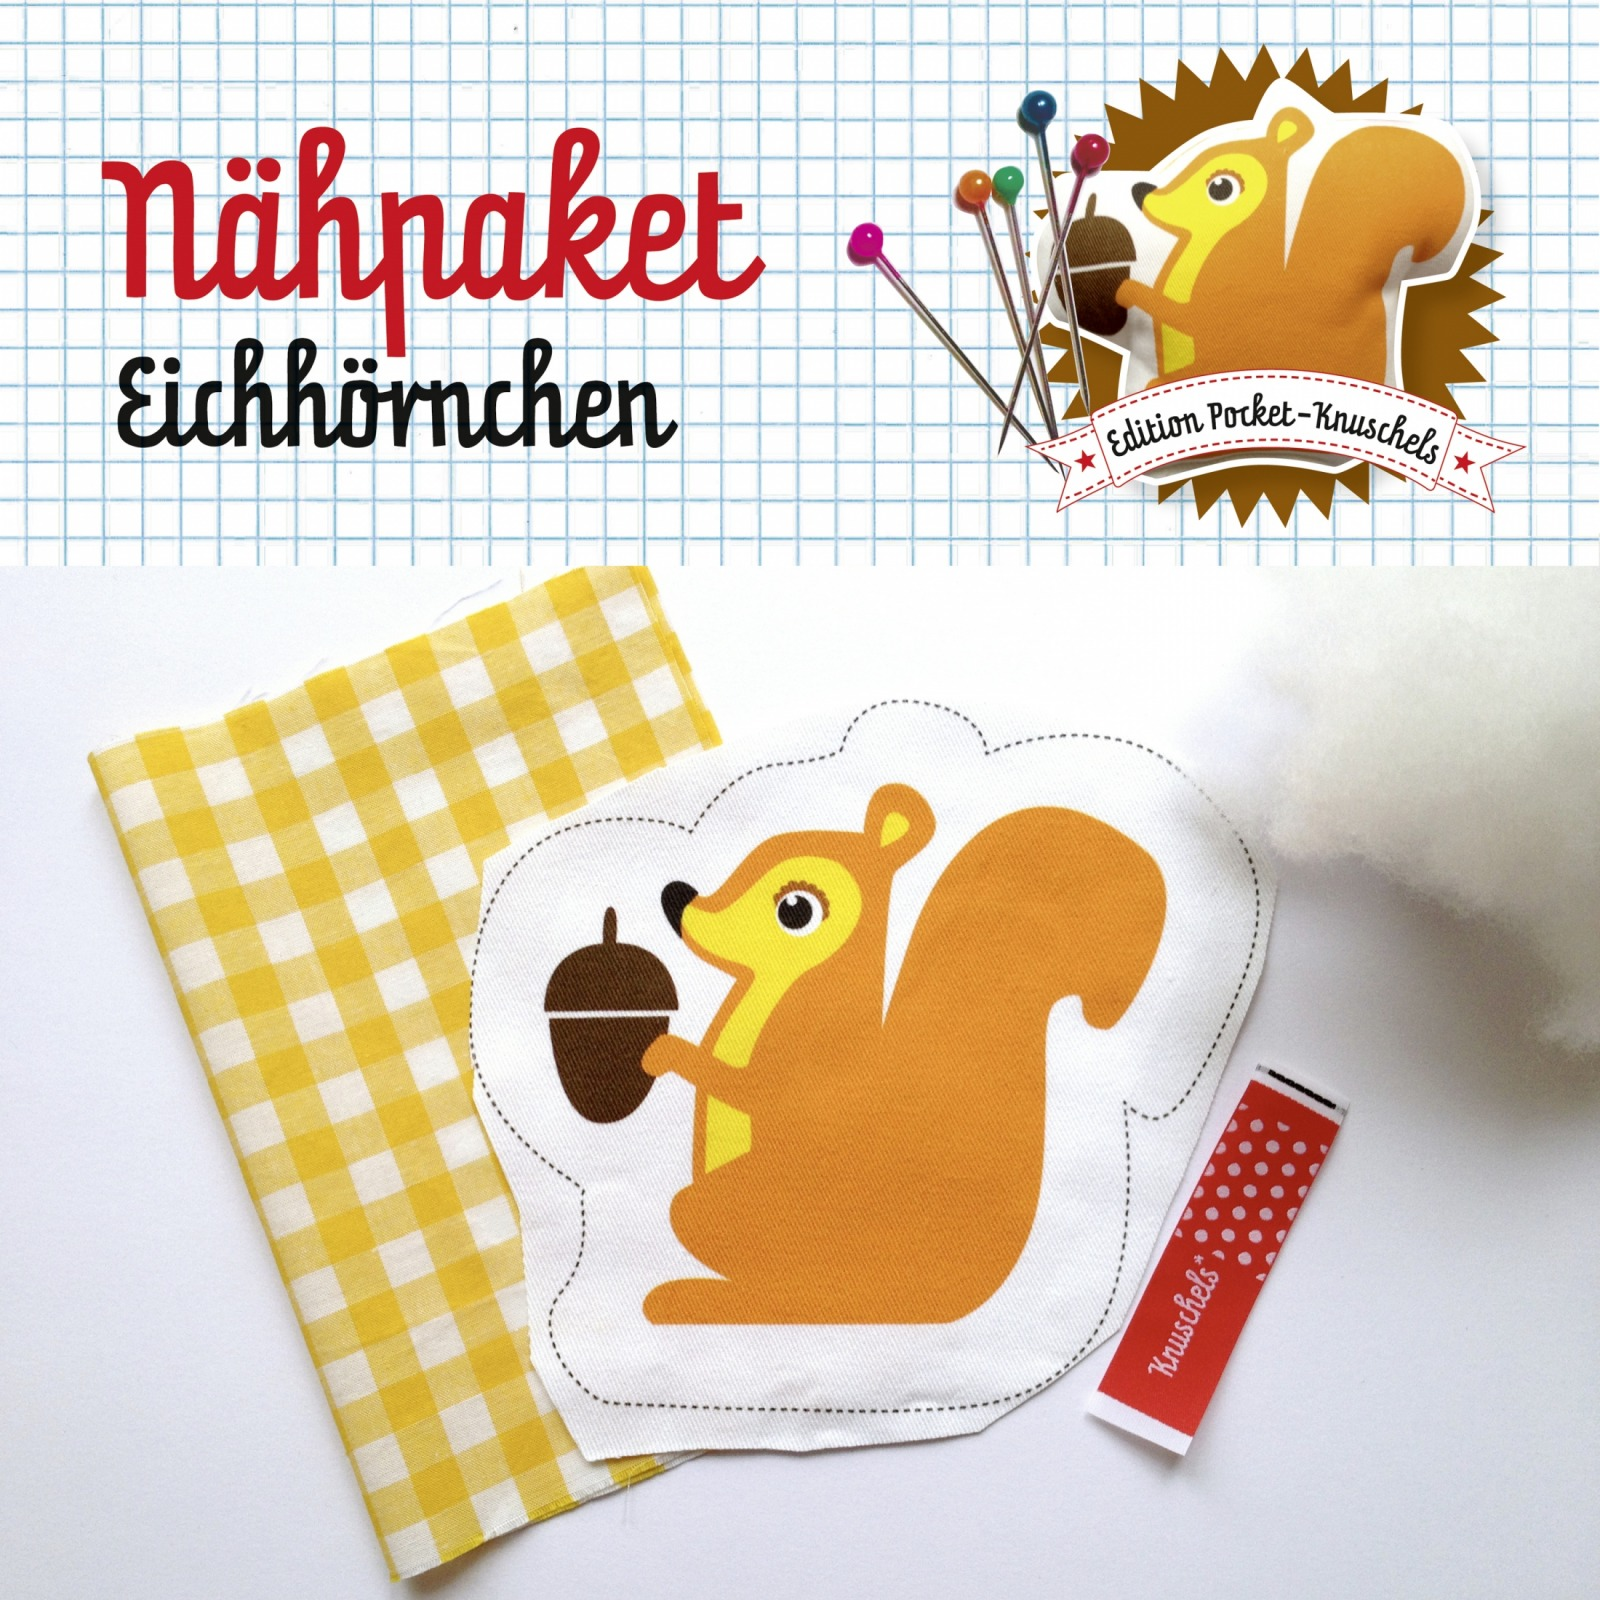 Nähpaket Eichhörnchen - 2